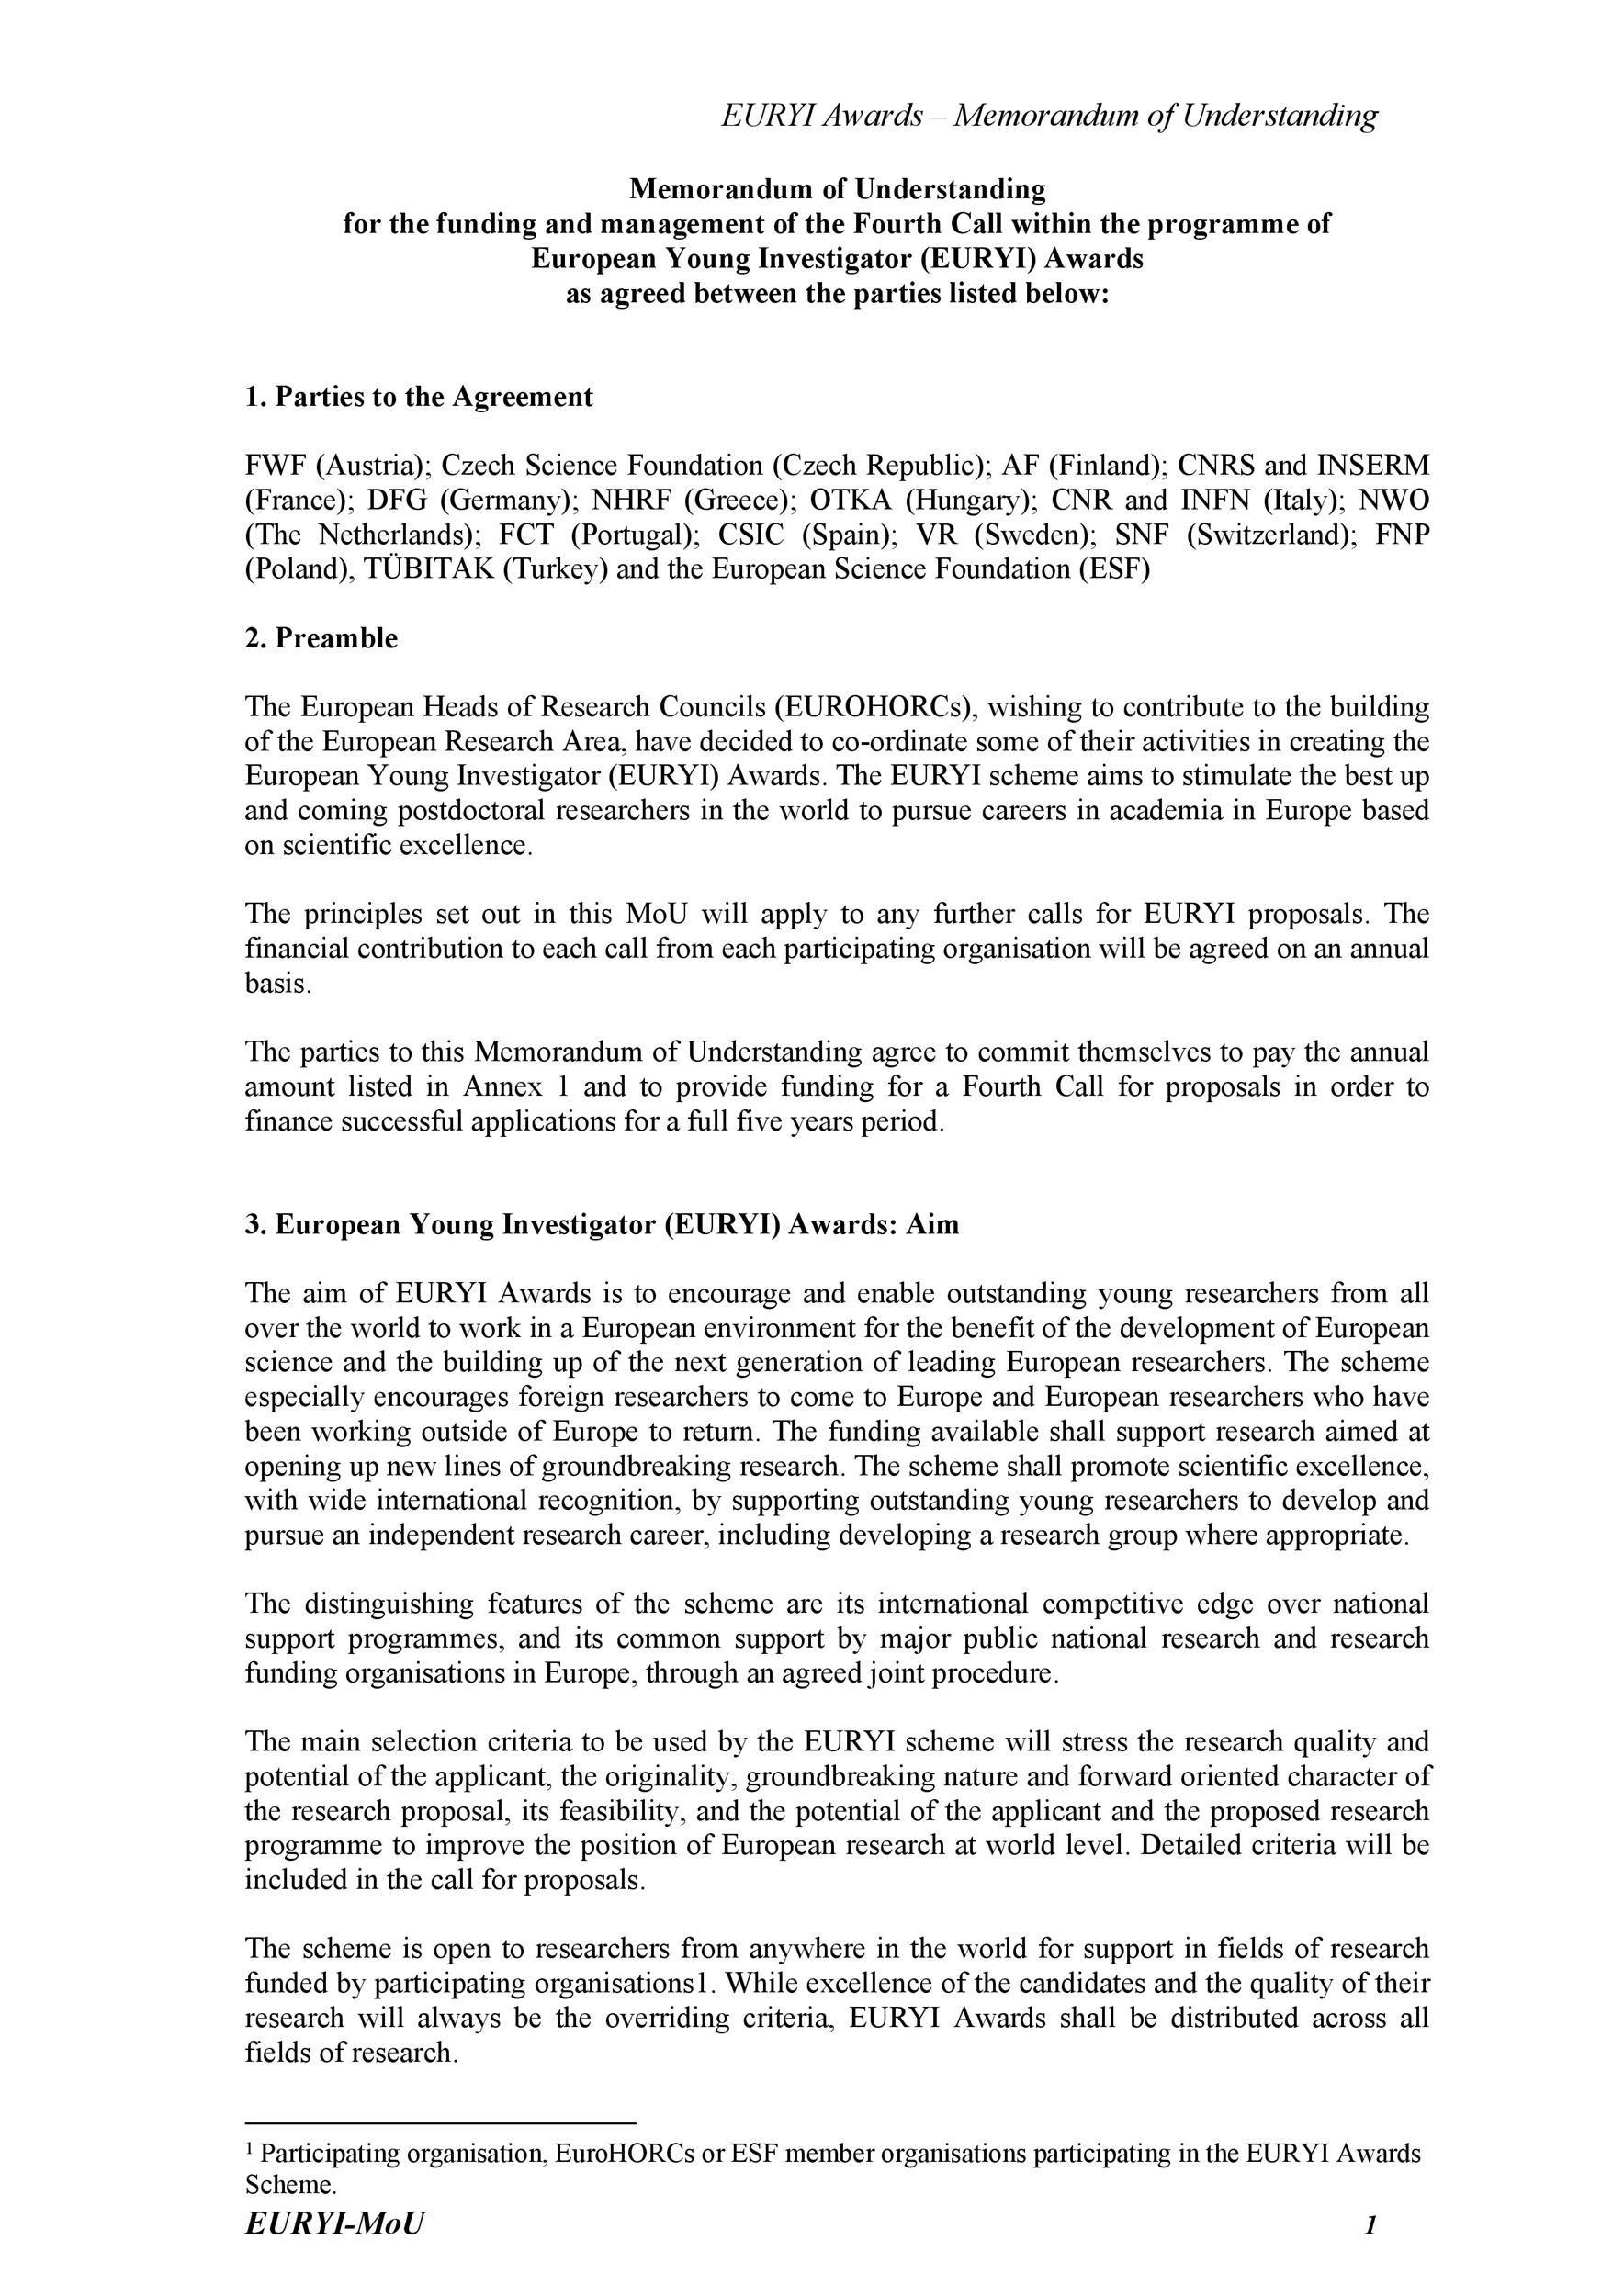 003 Shocking Letter Of Understanding Sample High Definition  Samples Template WordFull